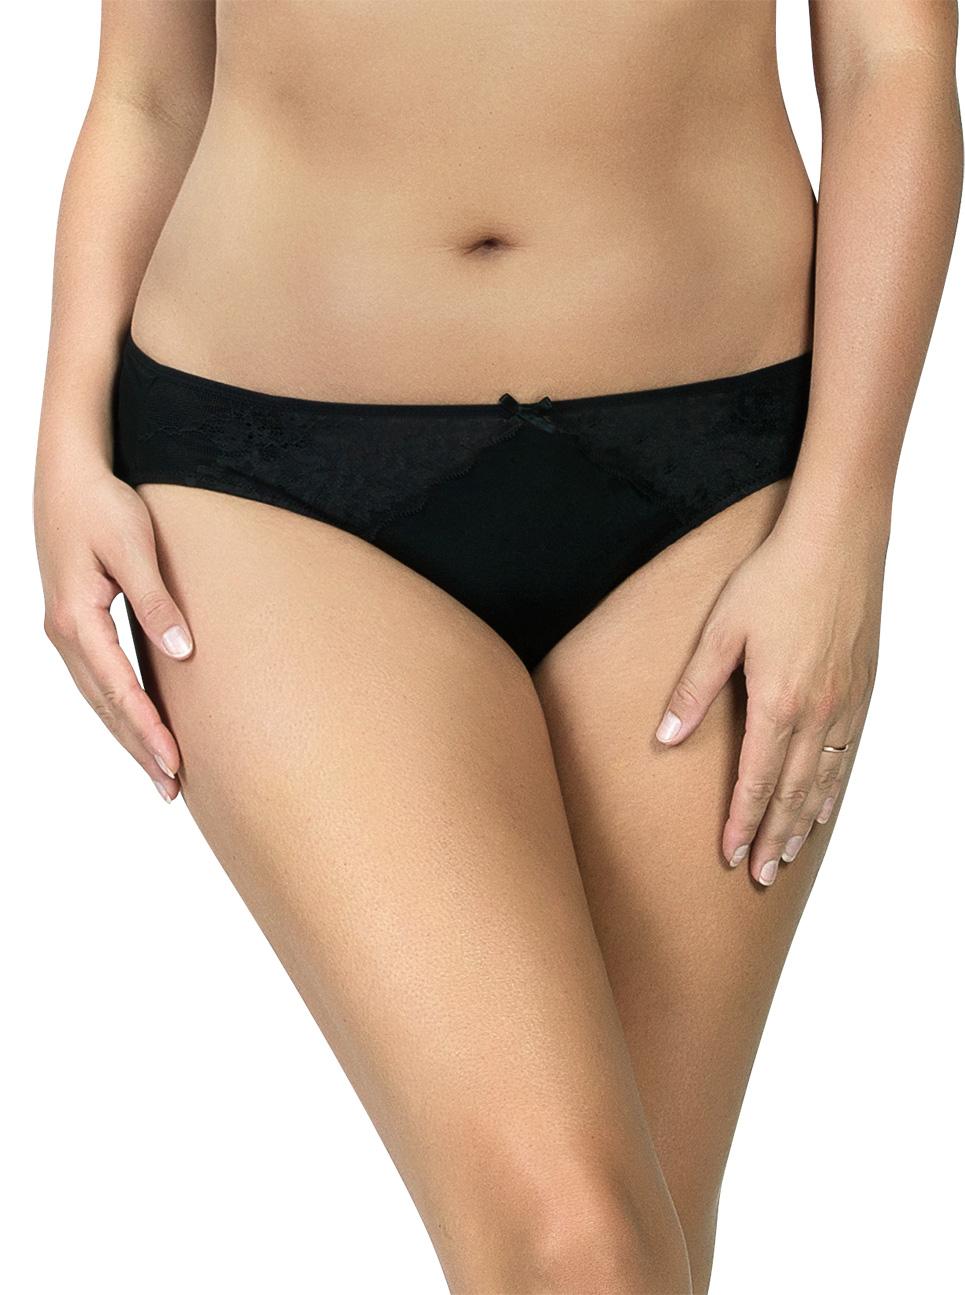 PARFAIT Aubrey Bikini P5763 Black Front - Aubrey Bikini Black P5763